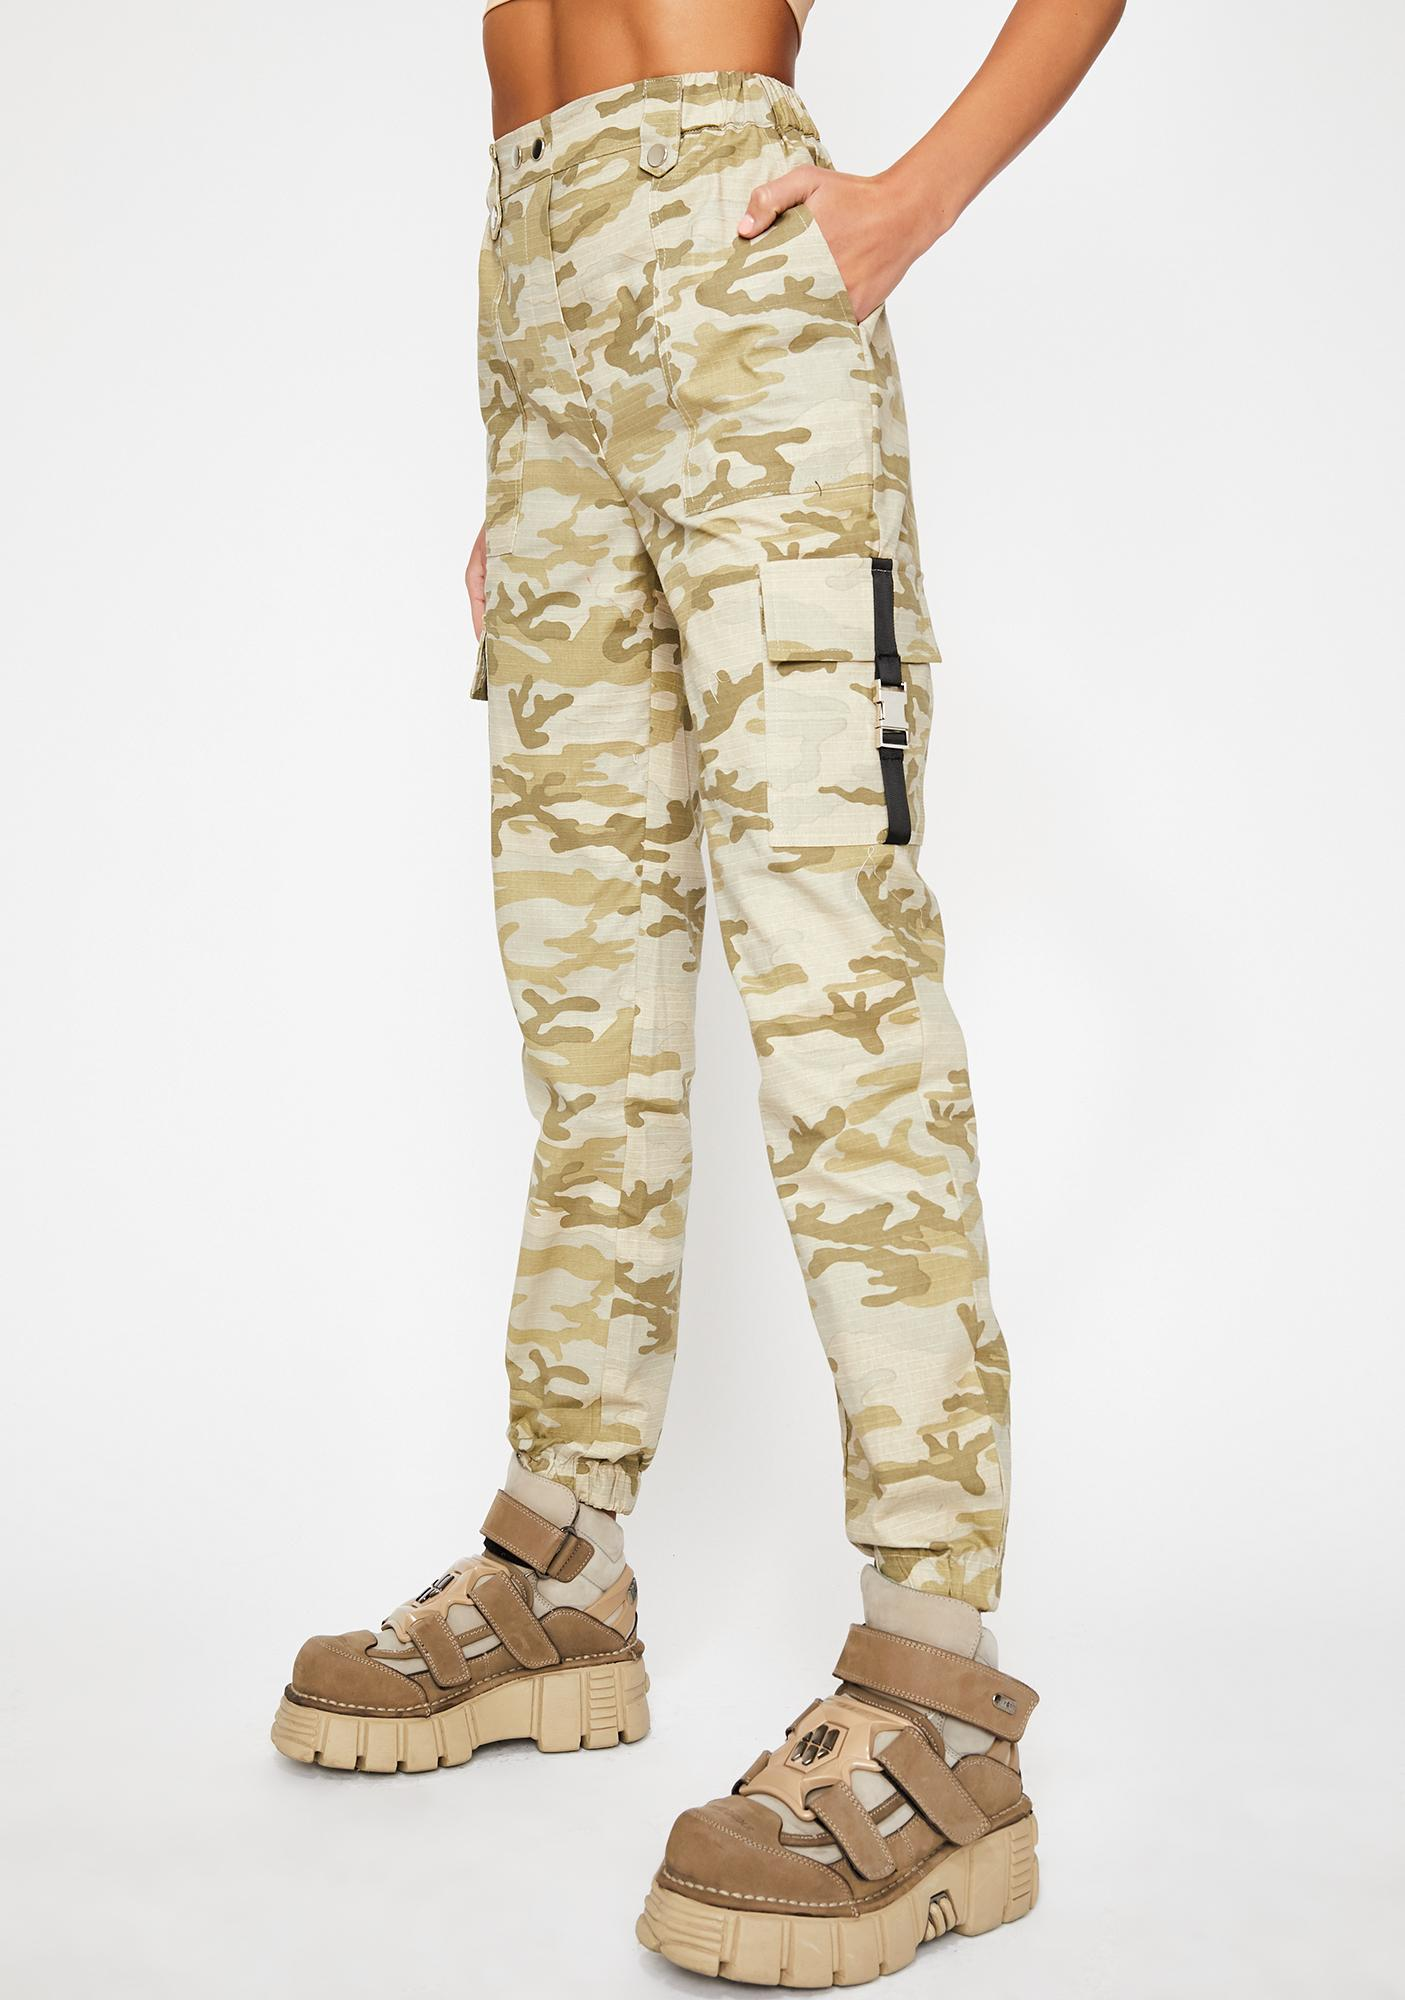 Tan Battle Rattle Cargo Pants